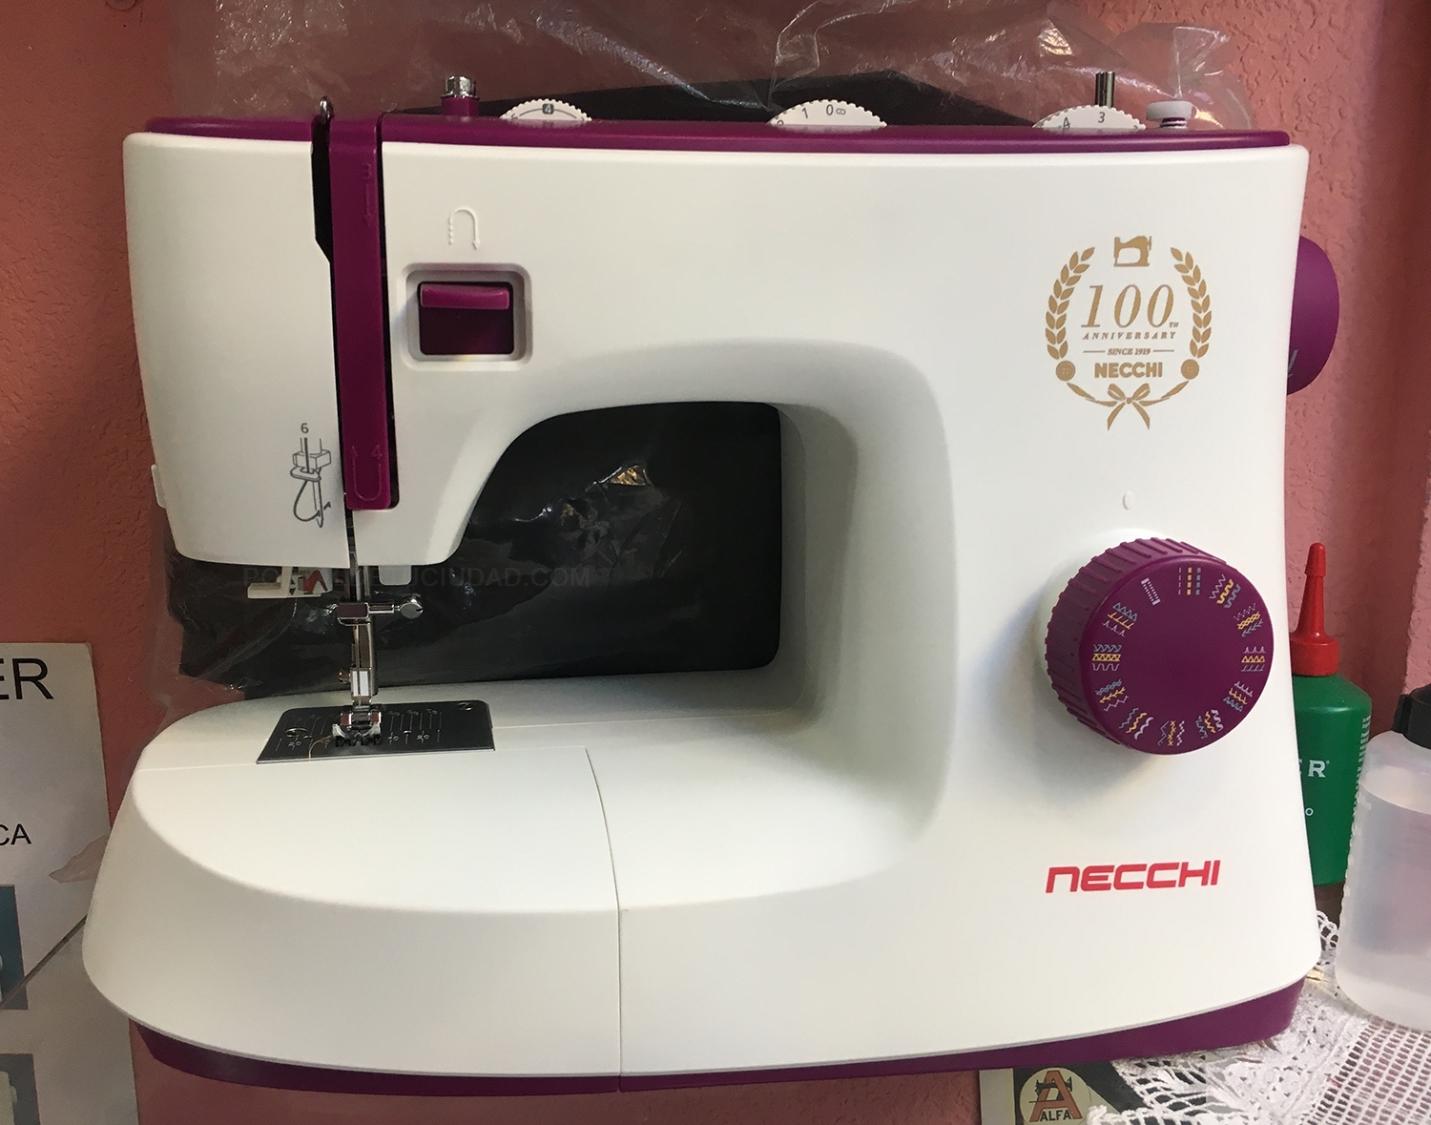 hilos de máquinas de coser cáceres